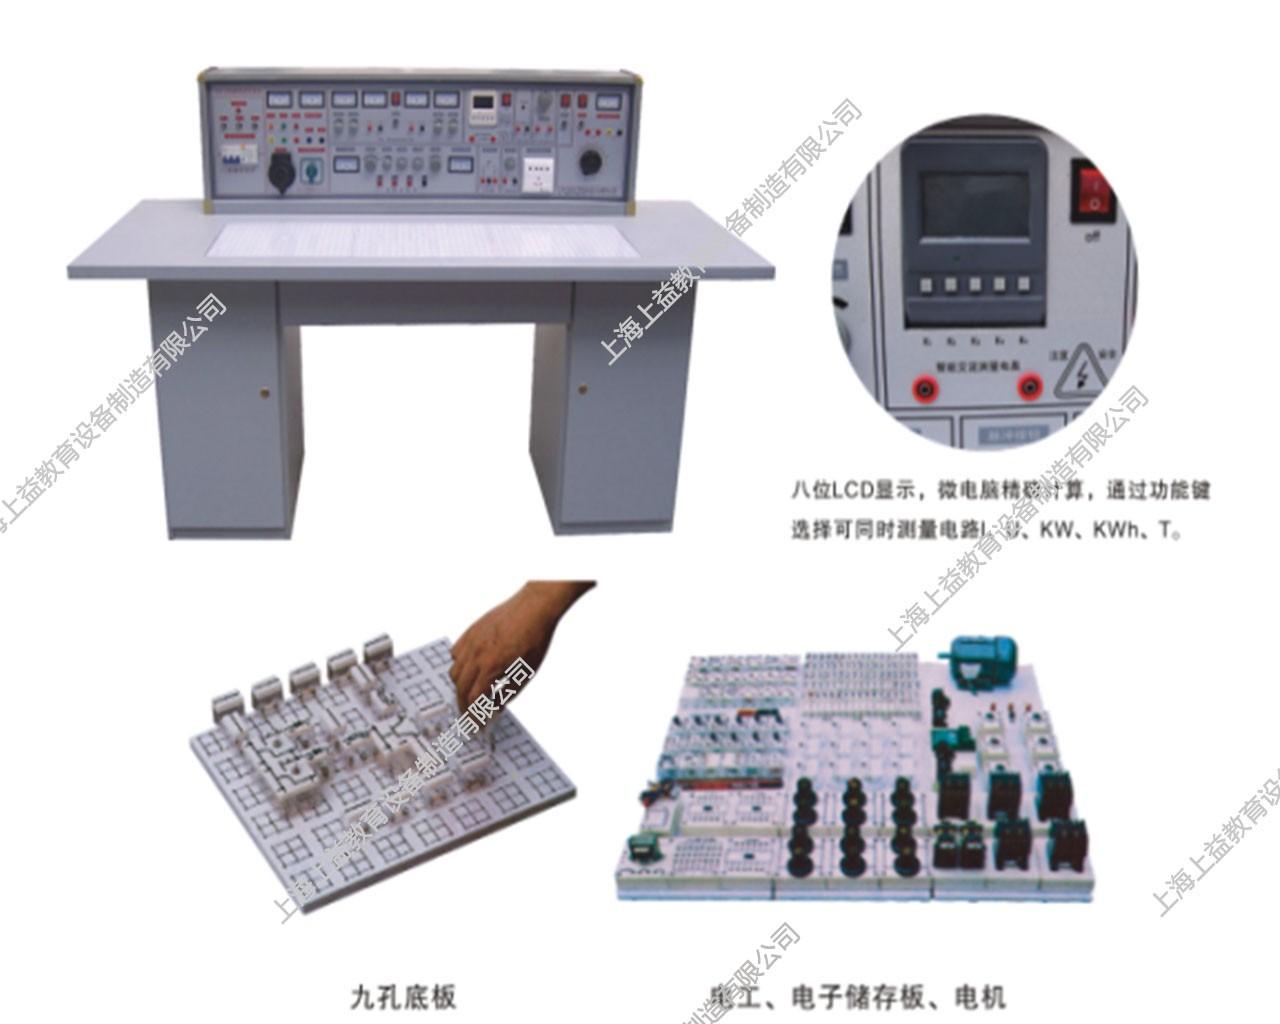 SYTY-181C通用智能型电工、电子实验室成套设备(带智能表,元件盒透明)